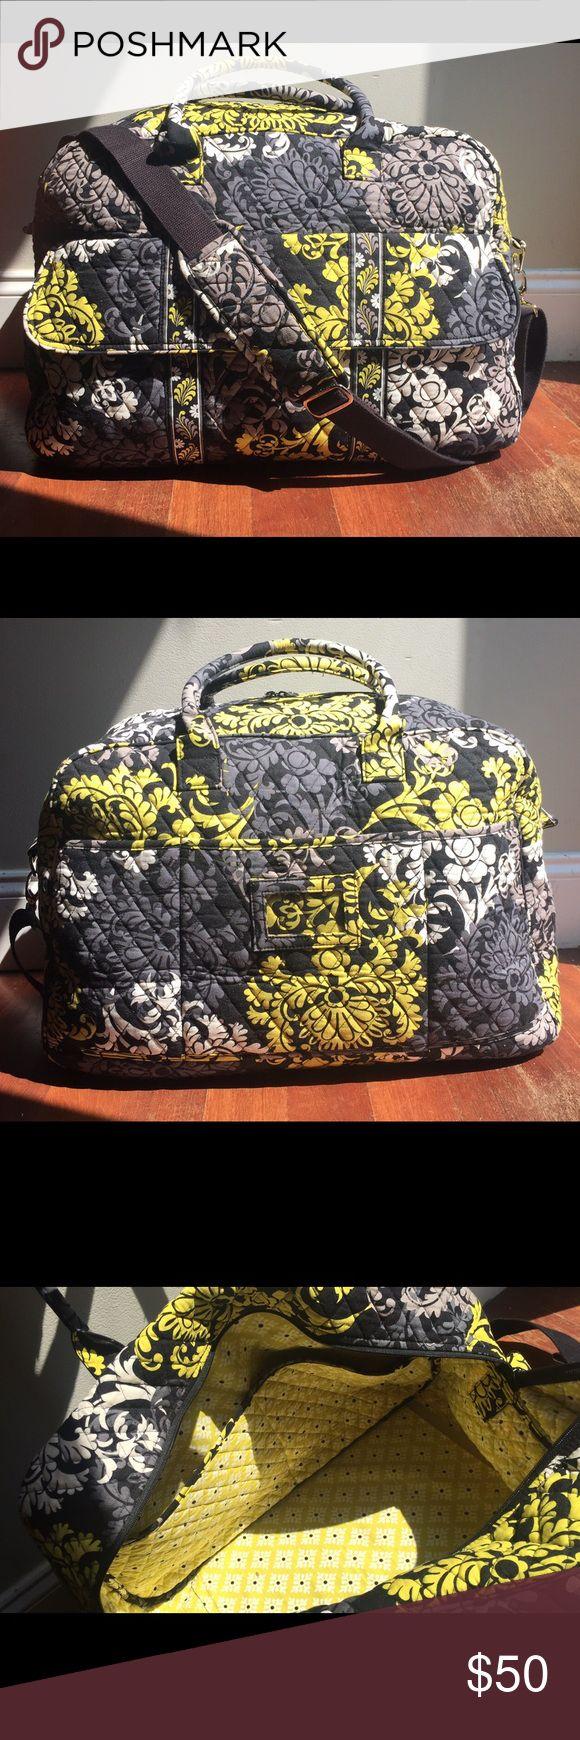 Euc vera bradley travel bag carry on bag w 5 inner pockets front